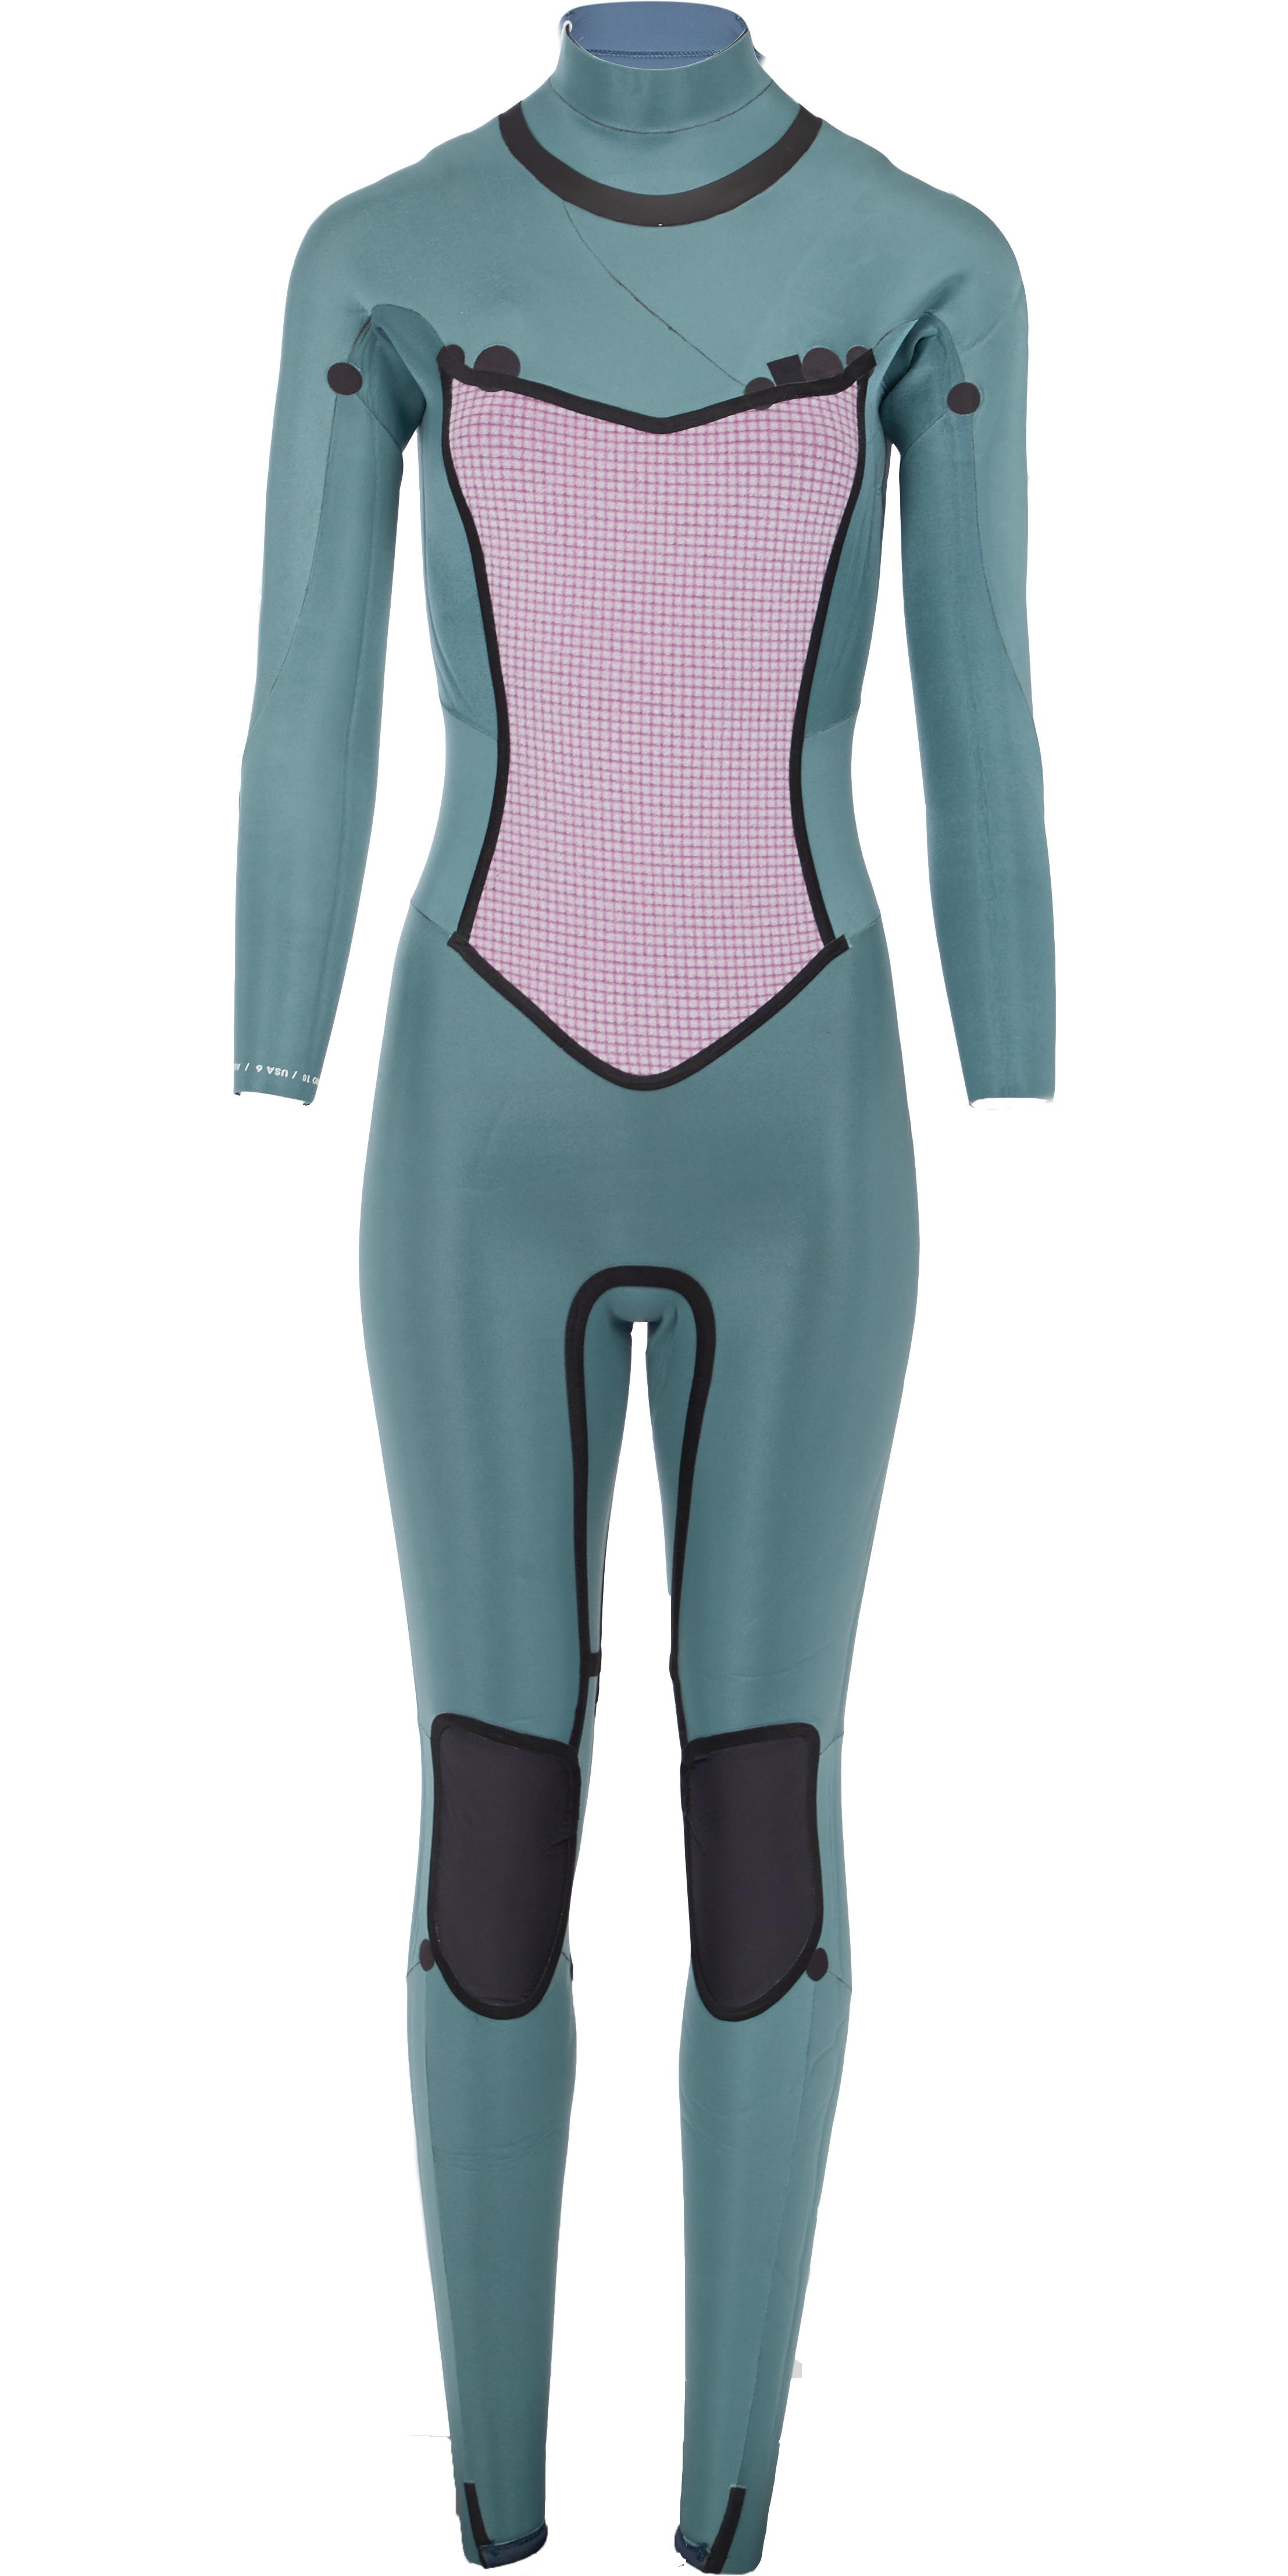 Billabong Womens Furnace Synergy 5/4mm Chest Zip Wetsuit Black L45G03